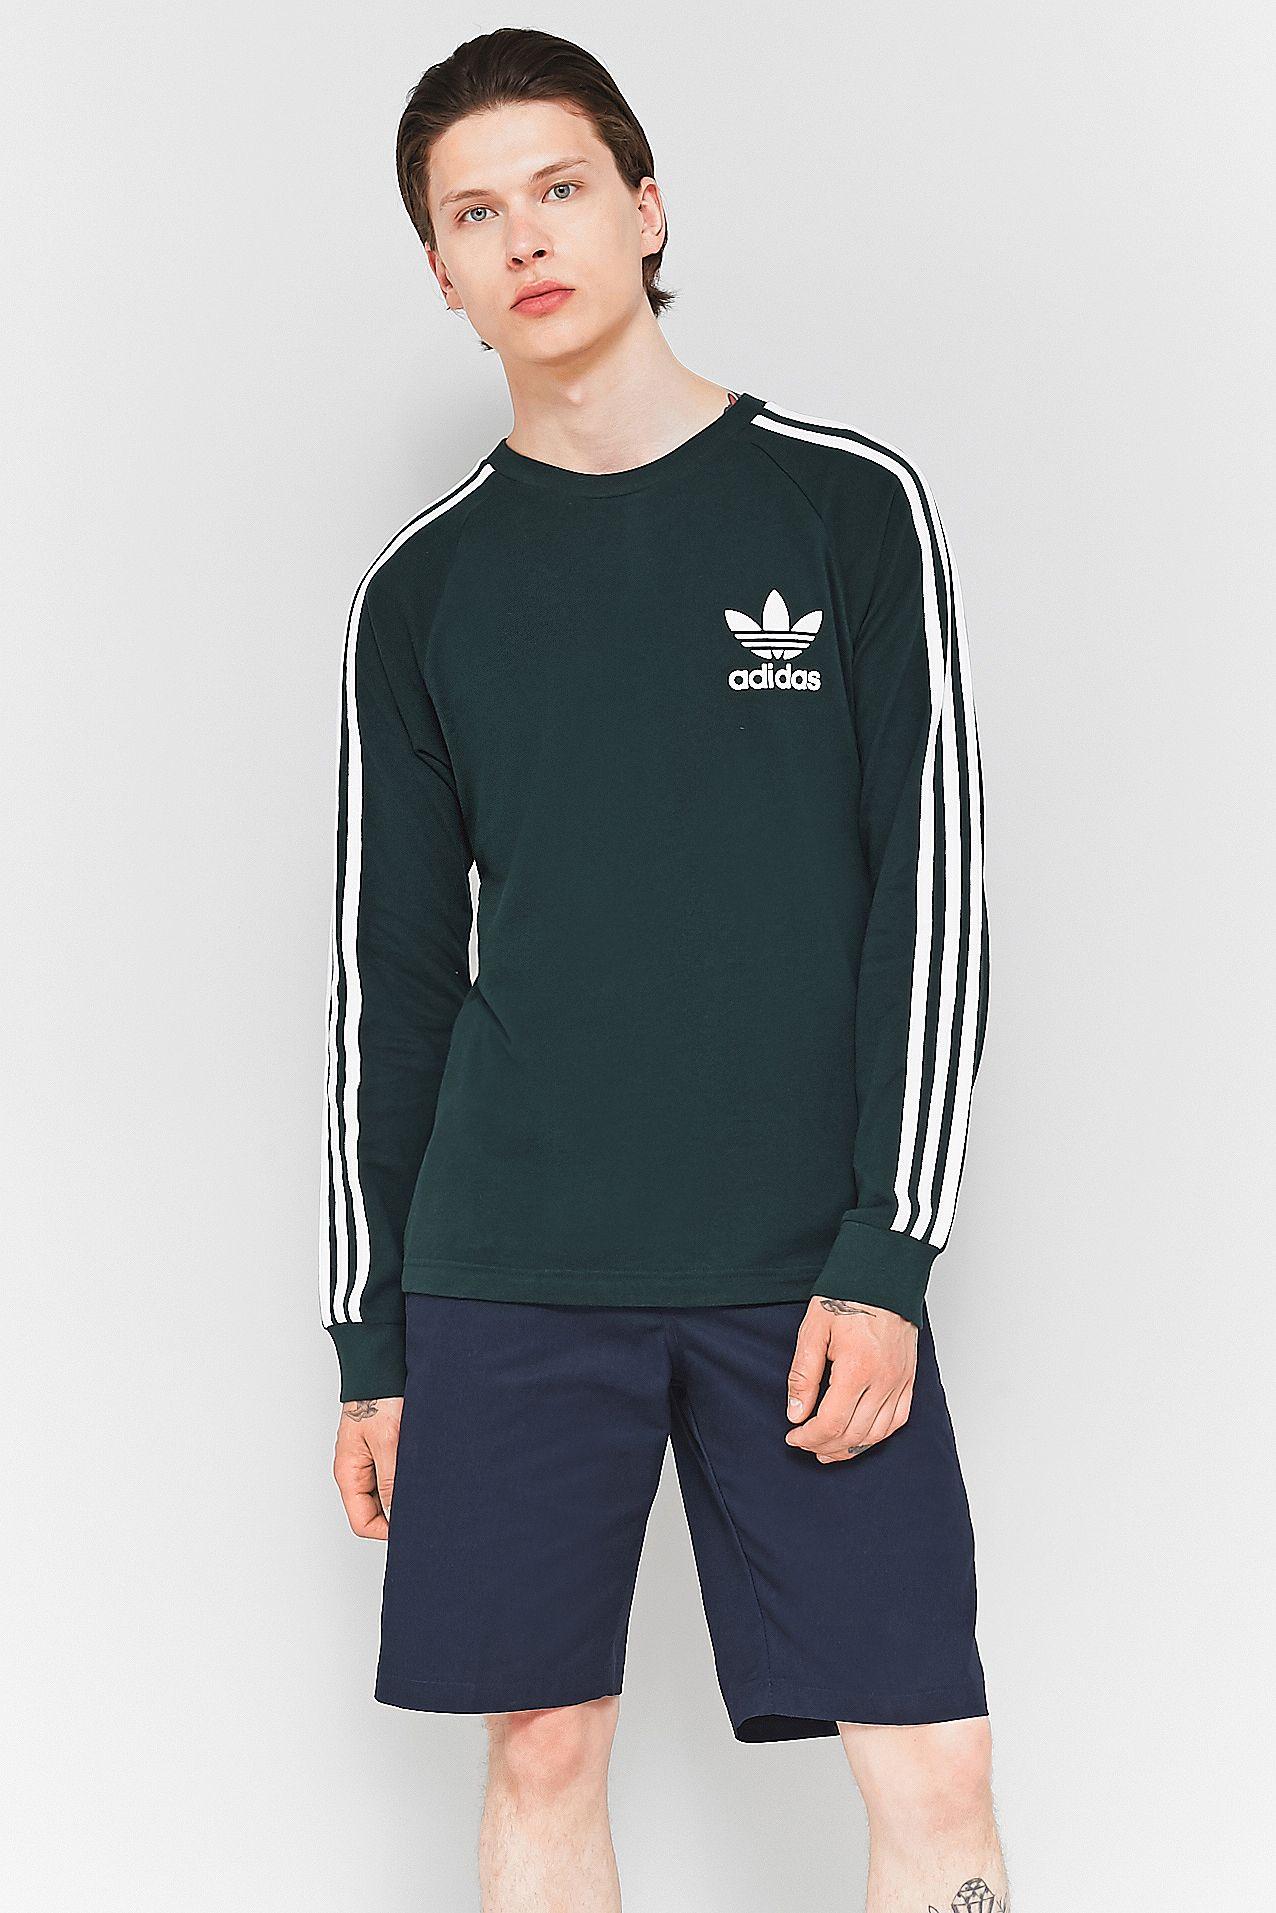 adidas California Green Night Pique Long Sleeve T shirt